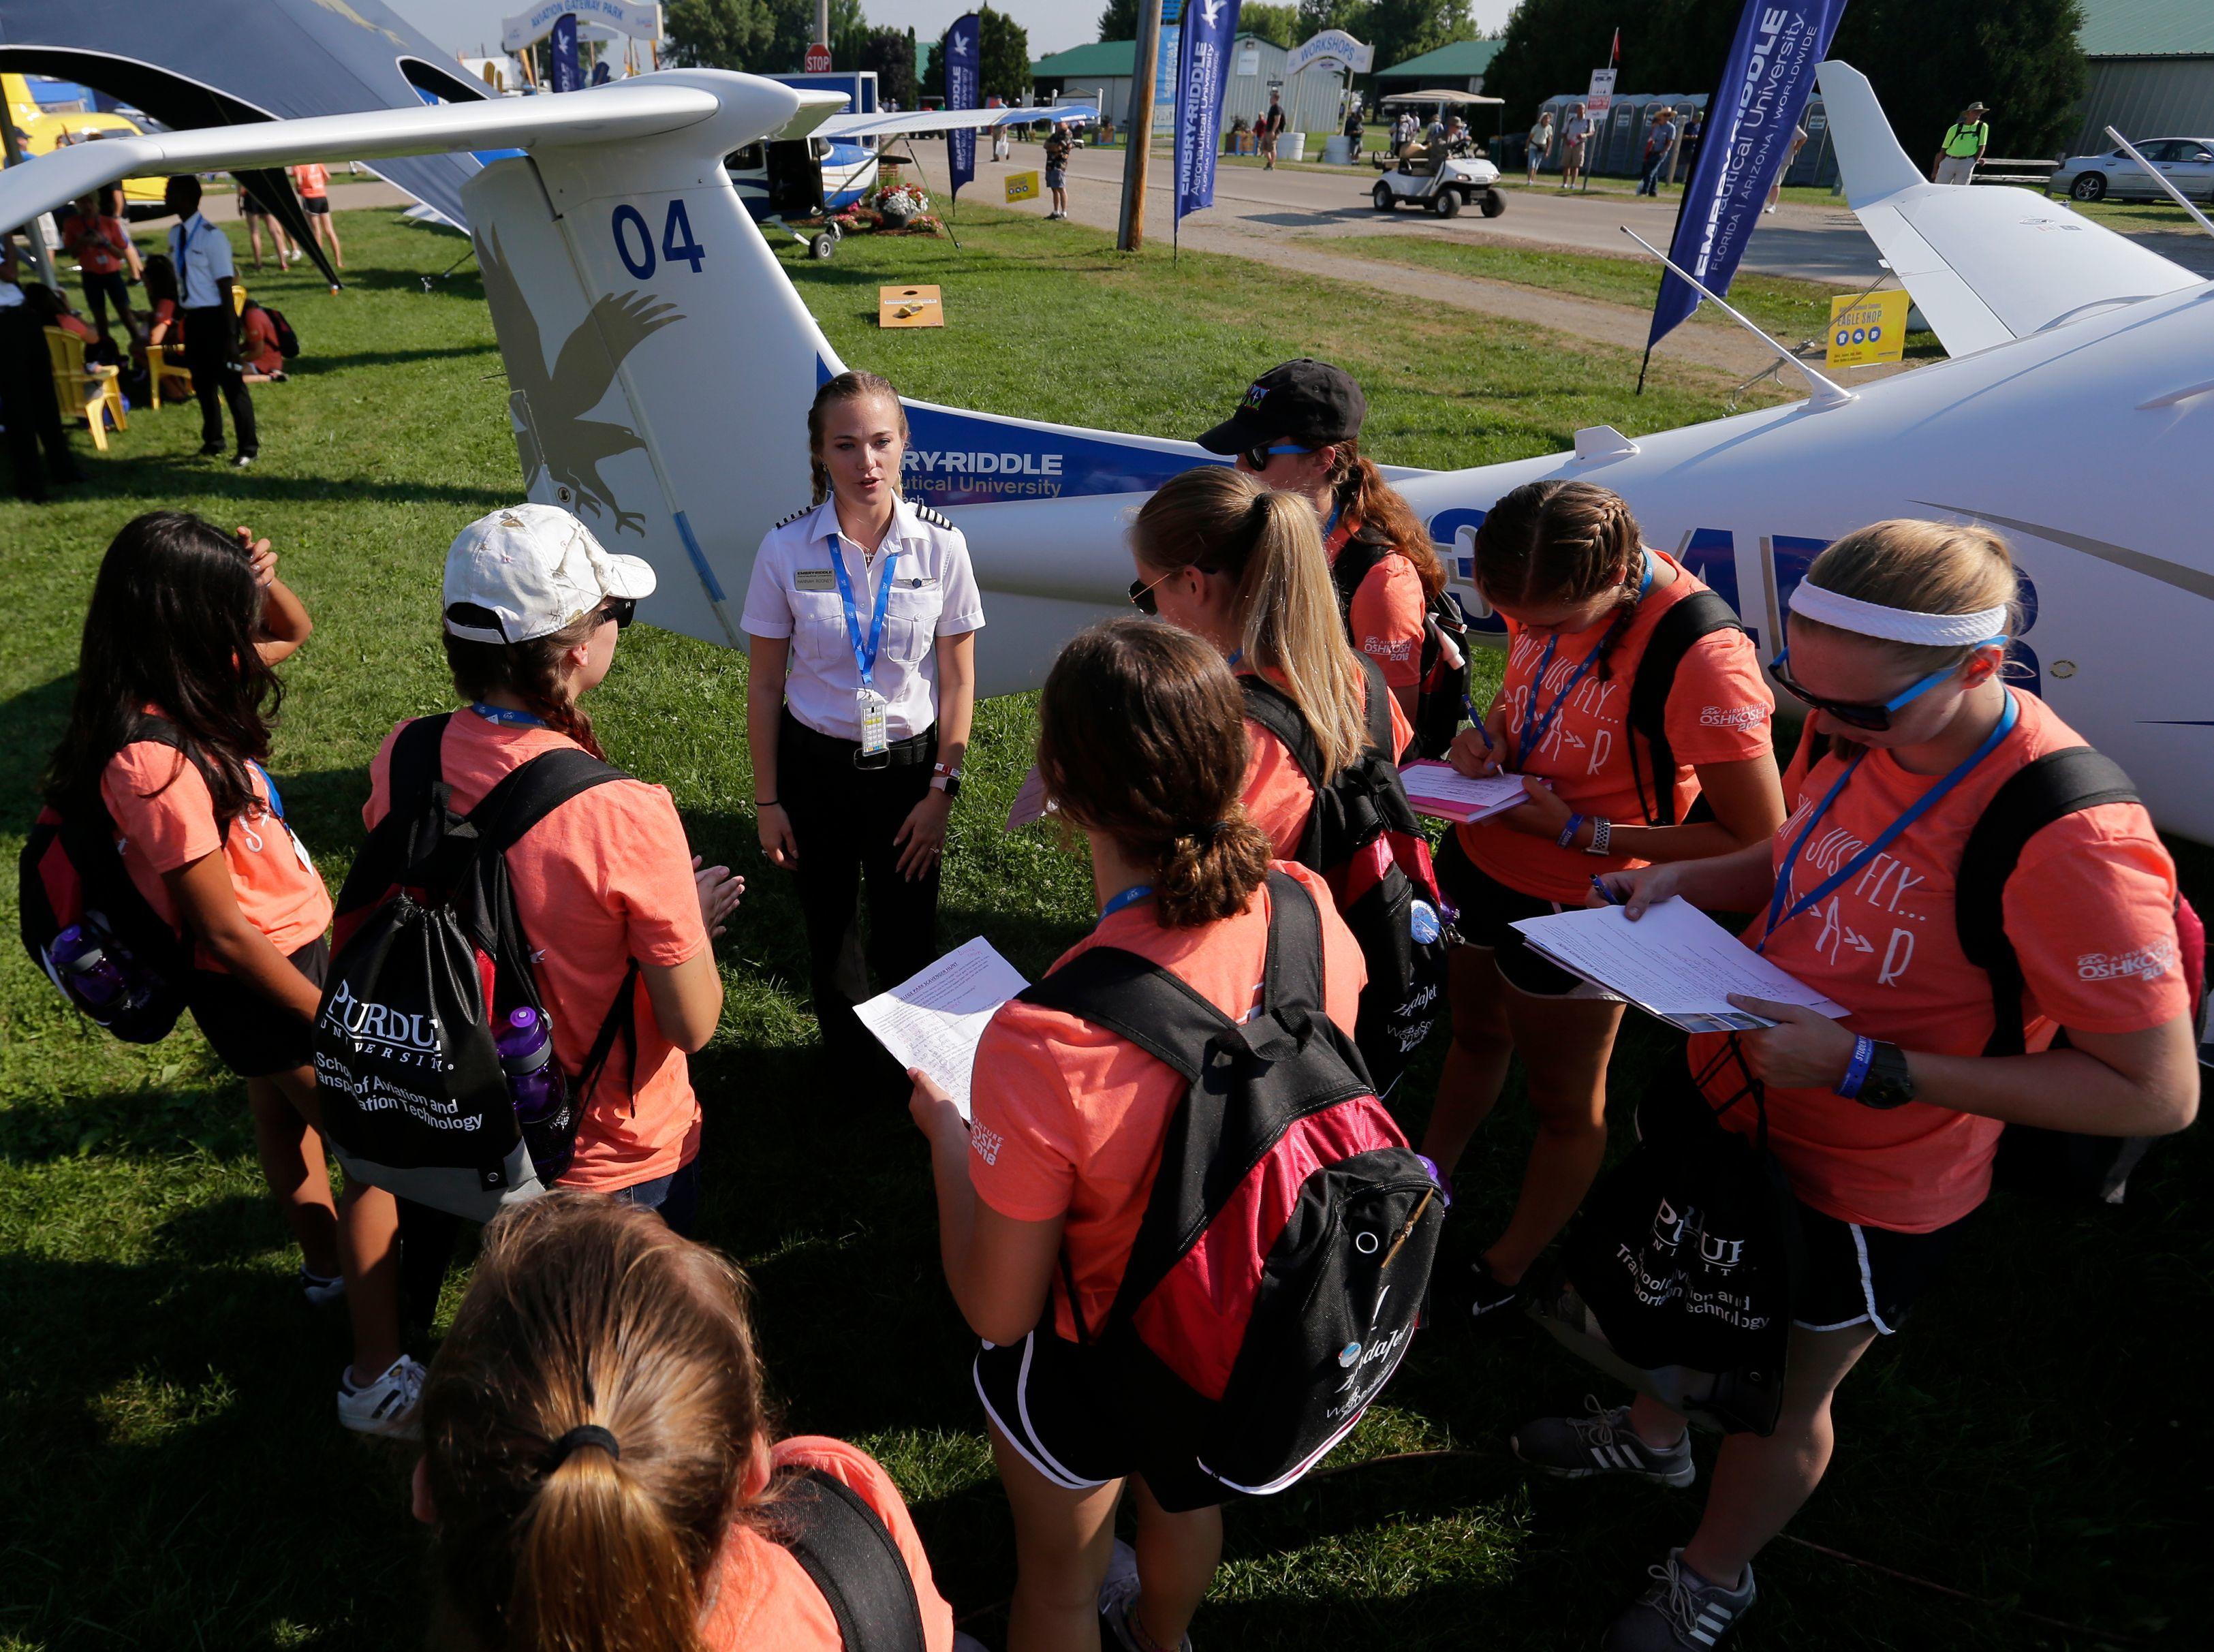 Pilot Hannah Rooney of Embry-Riddle Aeronautical University in Daytona Beach, Florida, talks with prospective candidates,Tuesday, July 24, 2018, at EAA AirVenture 2018 in Oshkosh.